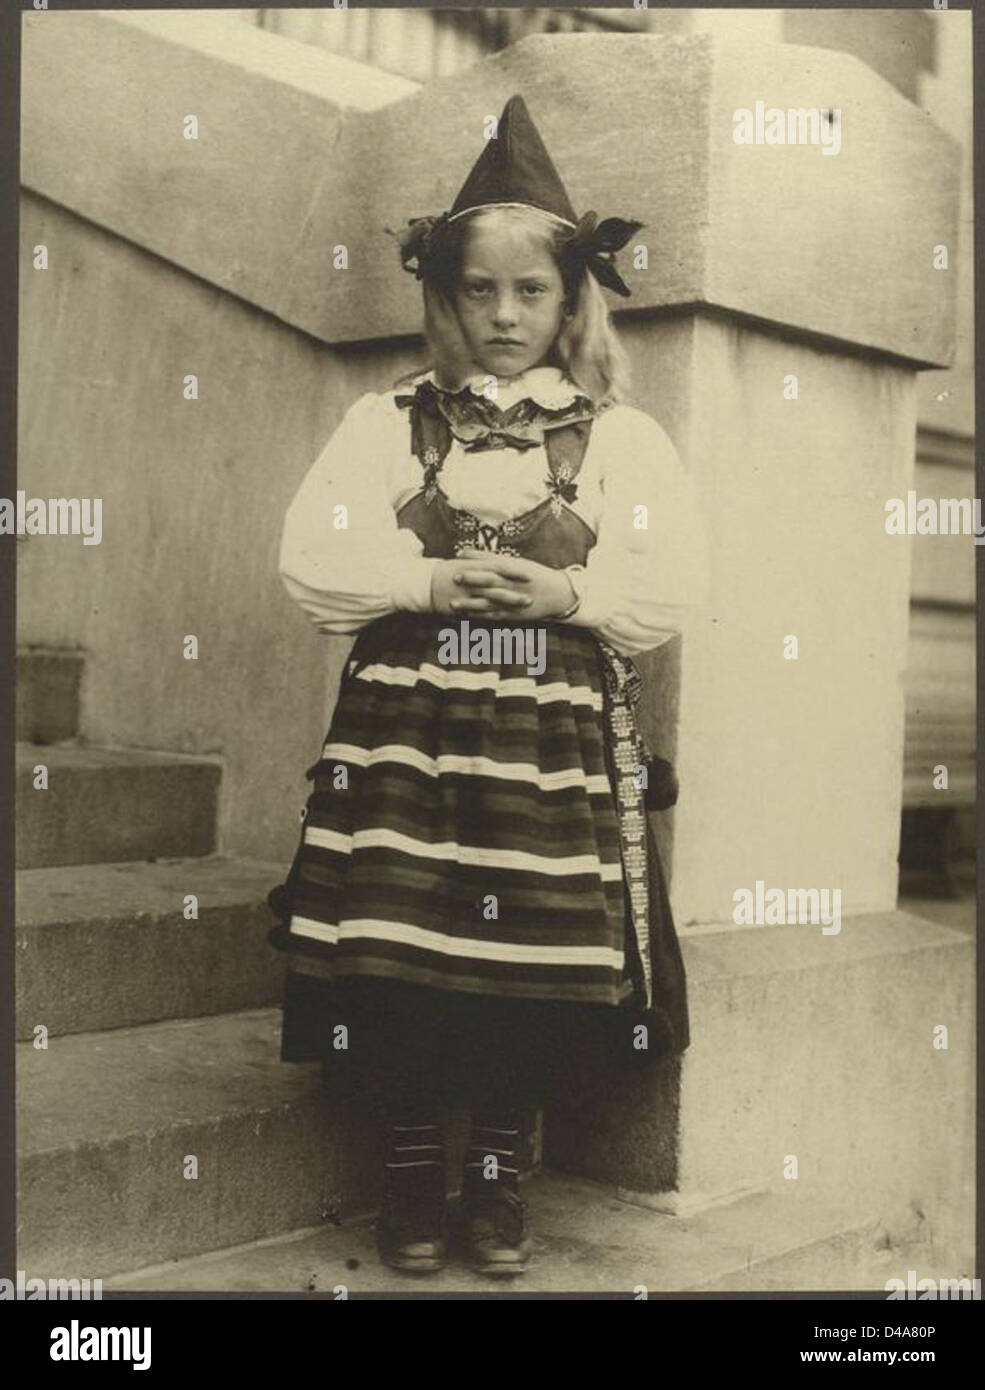 Girl from Rattvik, province of Dalarna, Sweden. - Stock Image